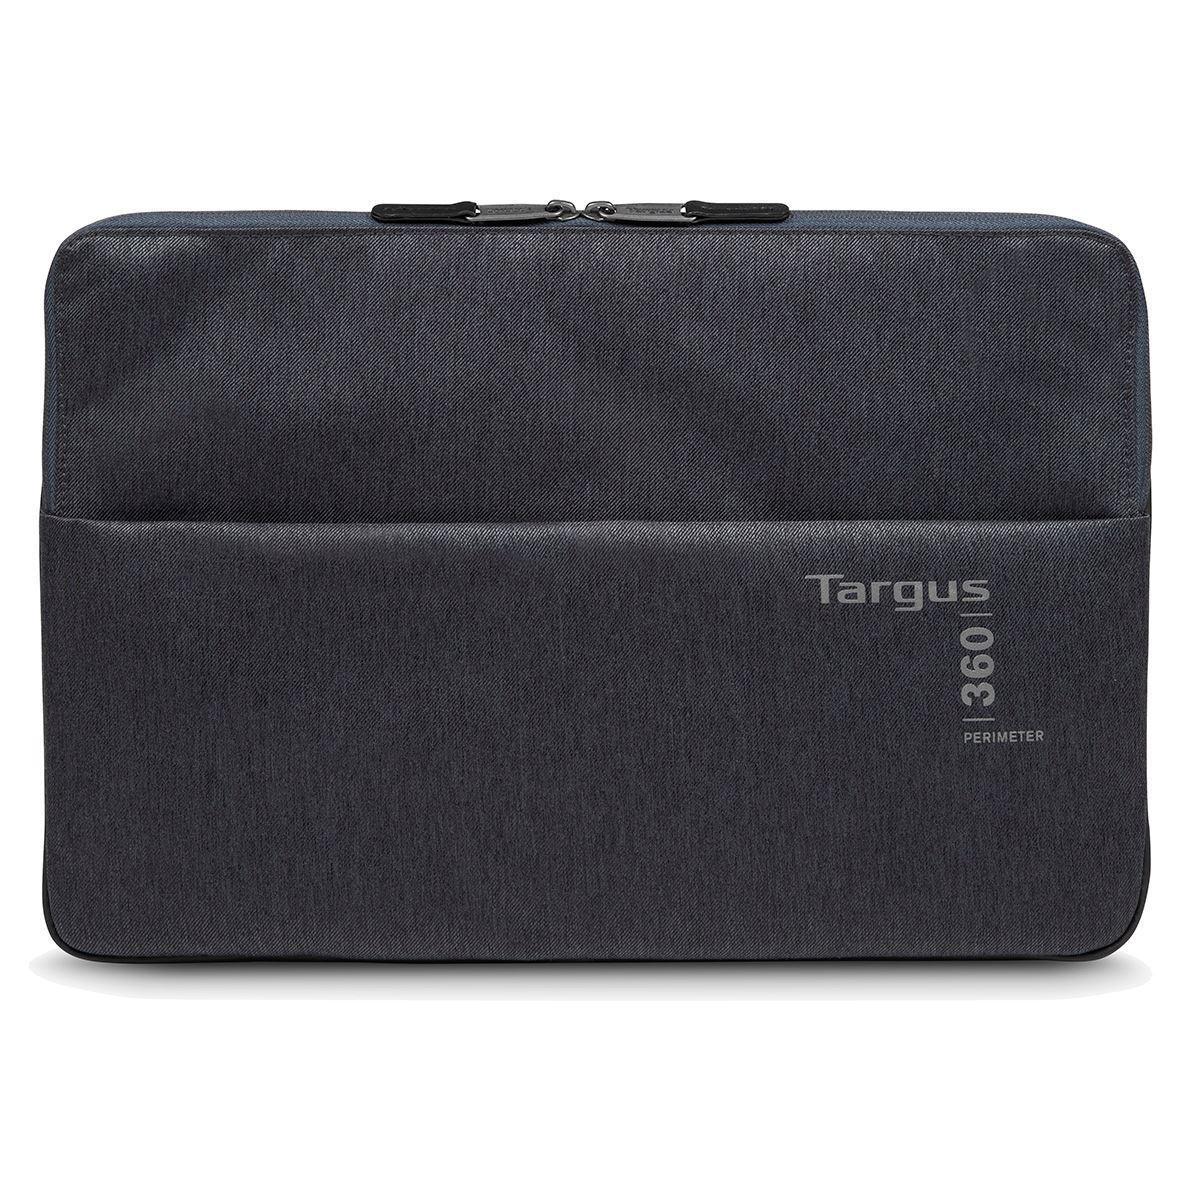 "Targus 360 Perimeter maletines para portátil 33,8 cm (13.3"") Funda Gris"